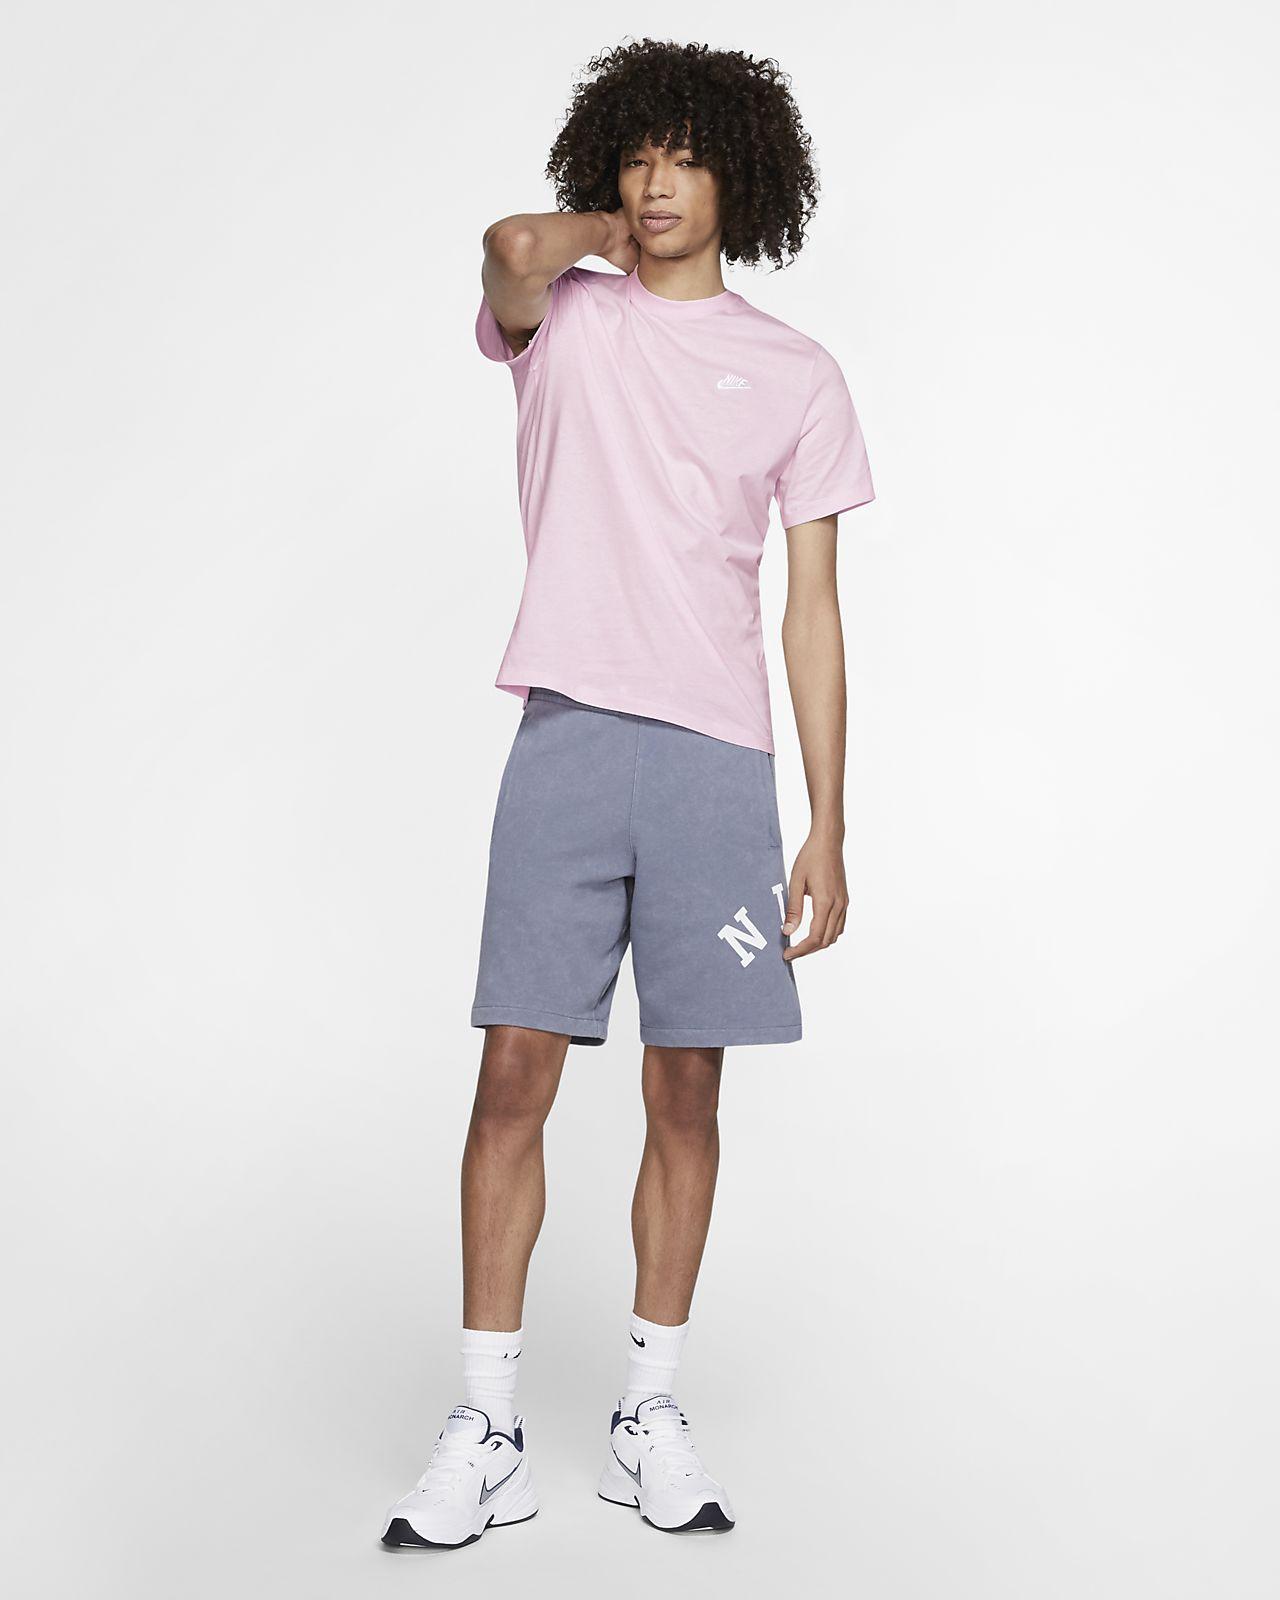 83355ed9d Nike Sportswear Club Men's T-Shirt. Nike.com